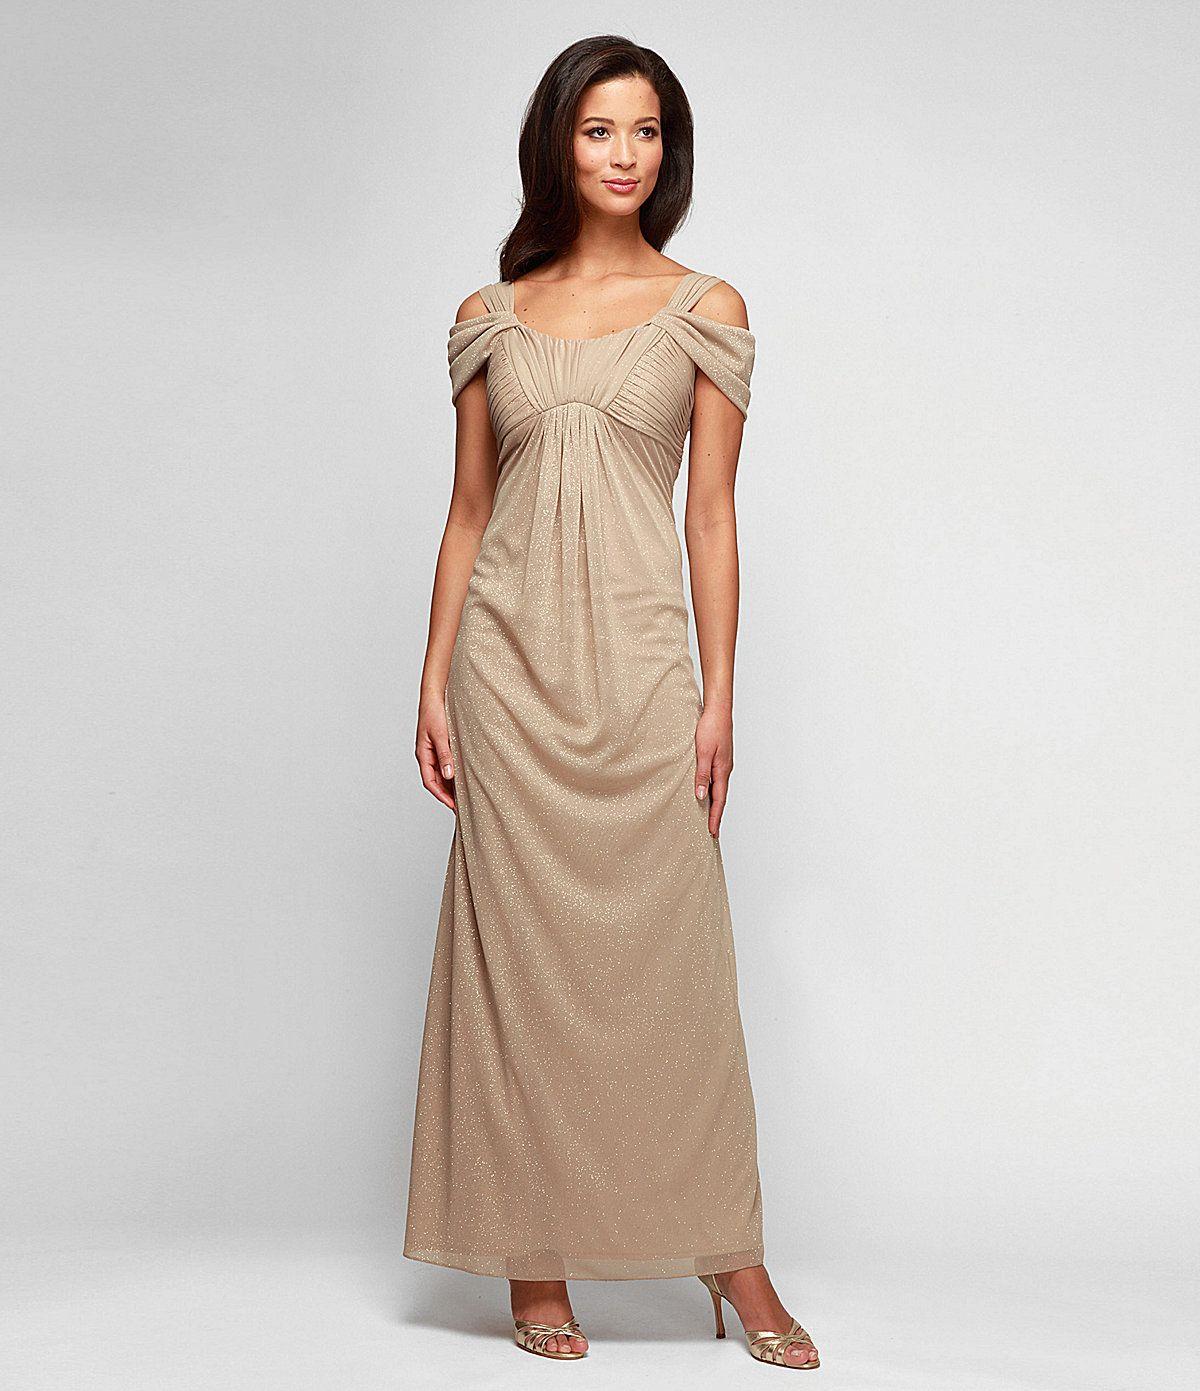 Alex evening dresses at dillards